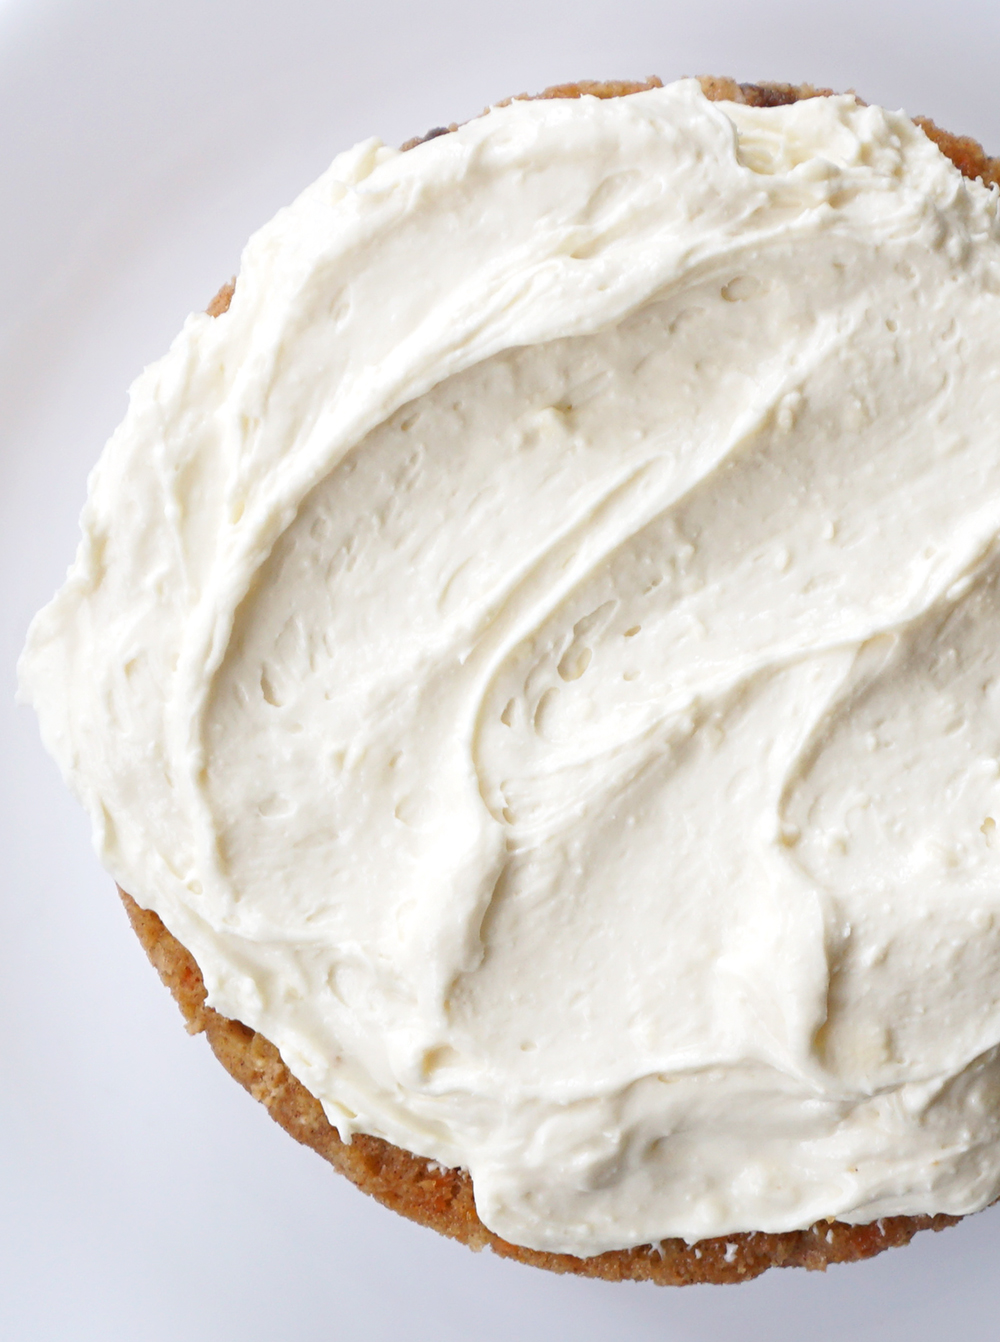 Grain-free carrot cake (keto, gluten free)